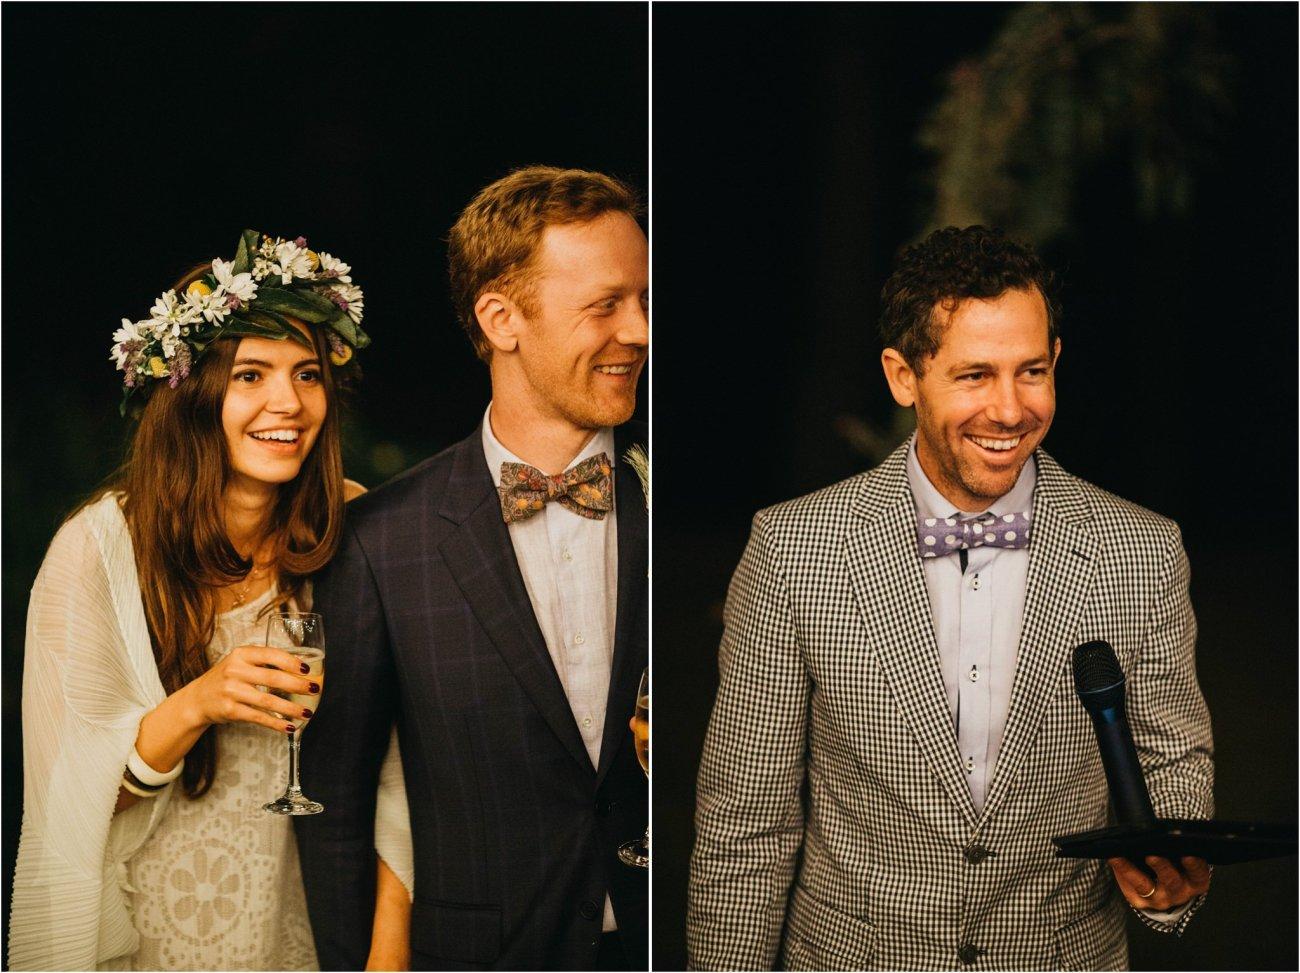 hunter-valley-wedding-photographer-joshua-mikhaiel814